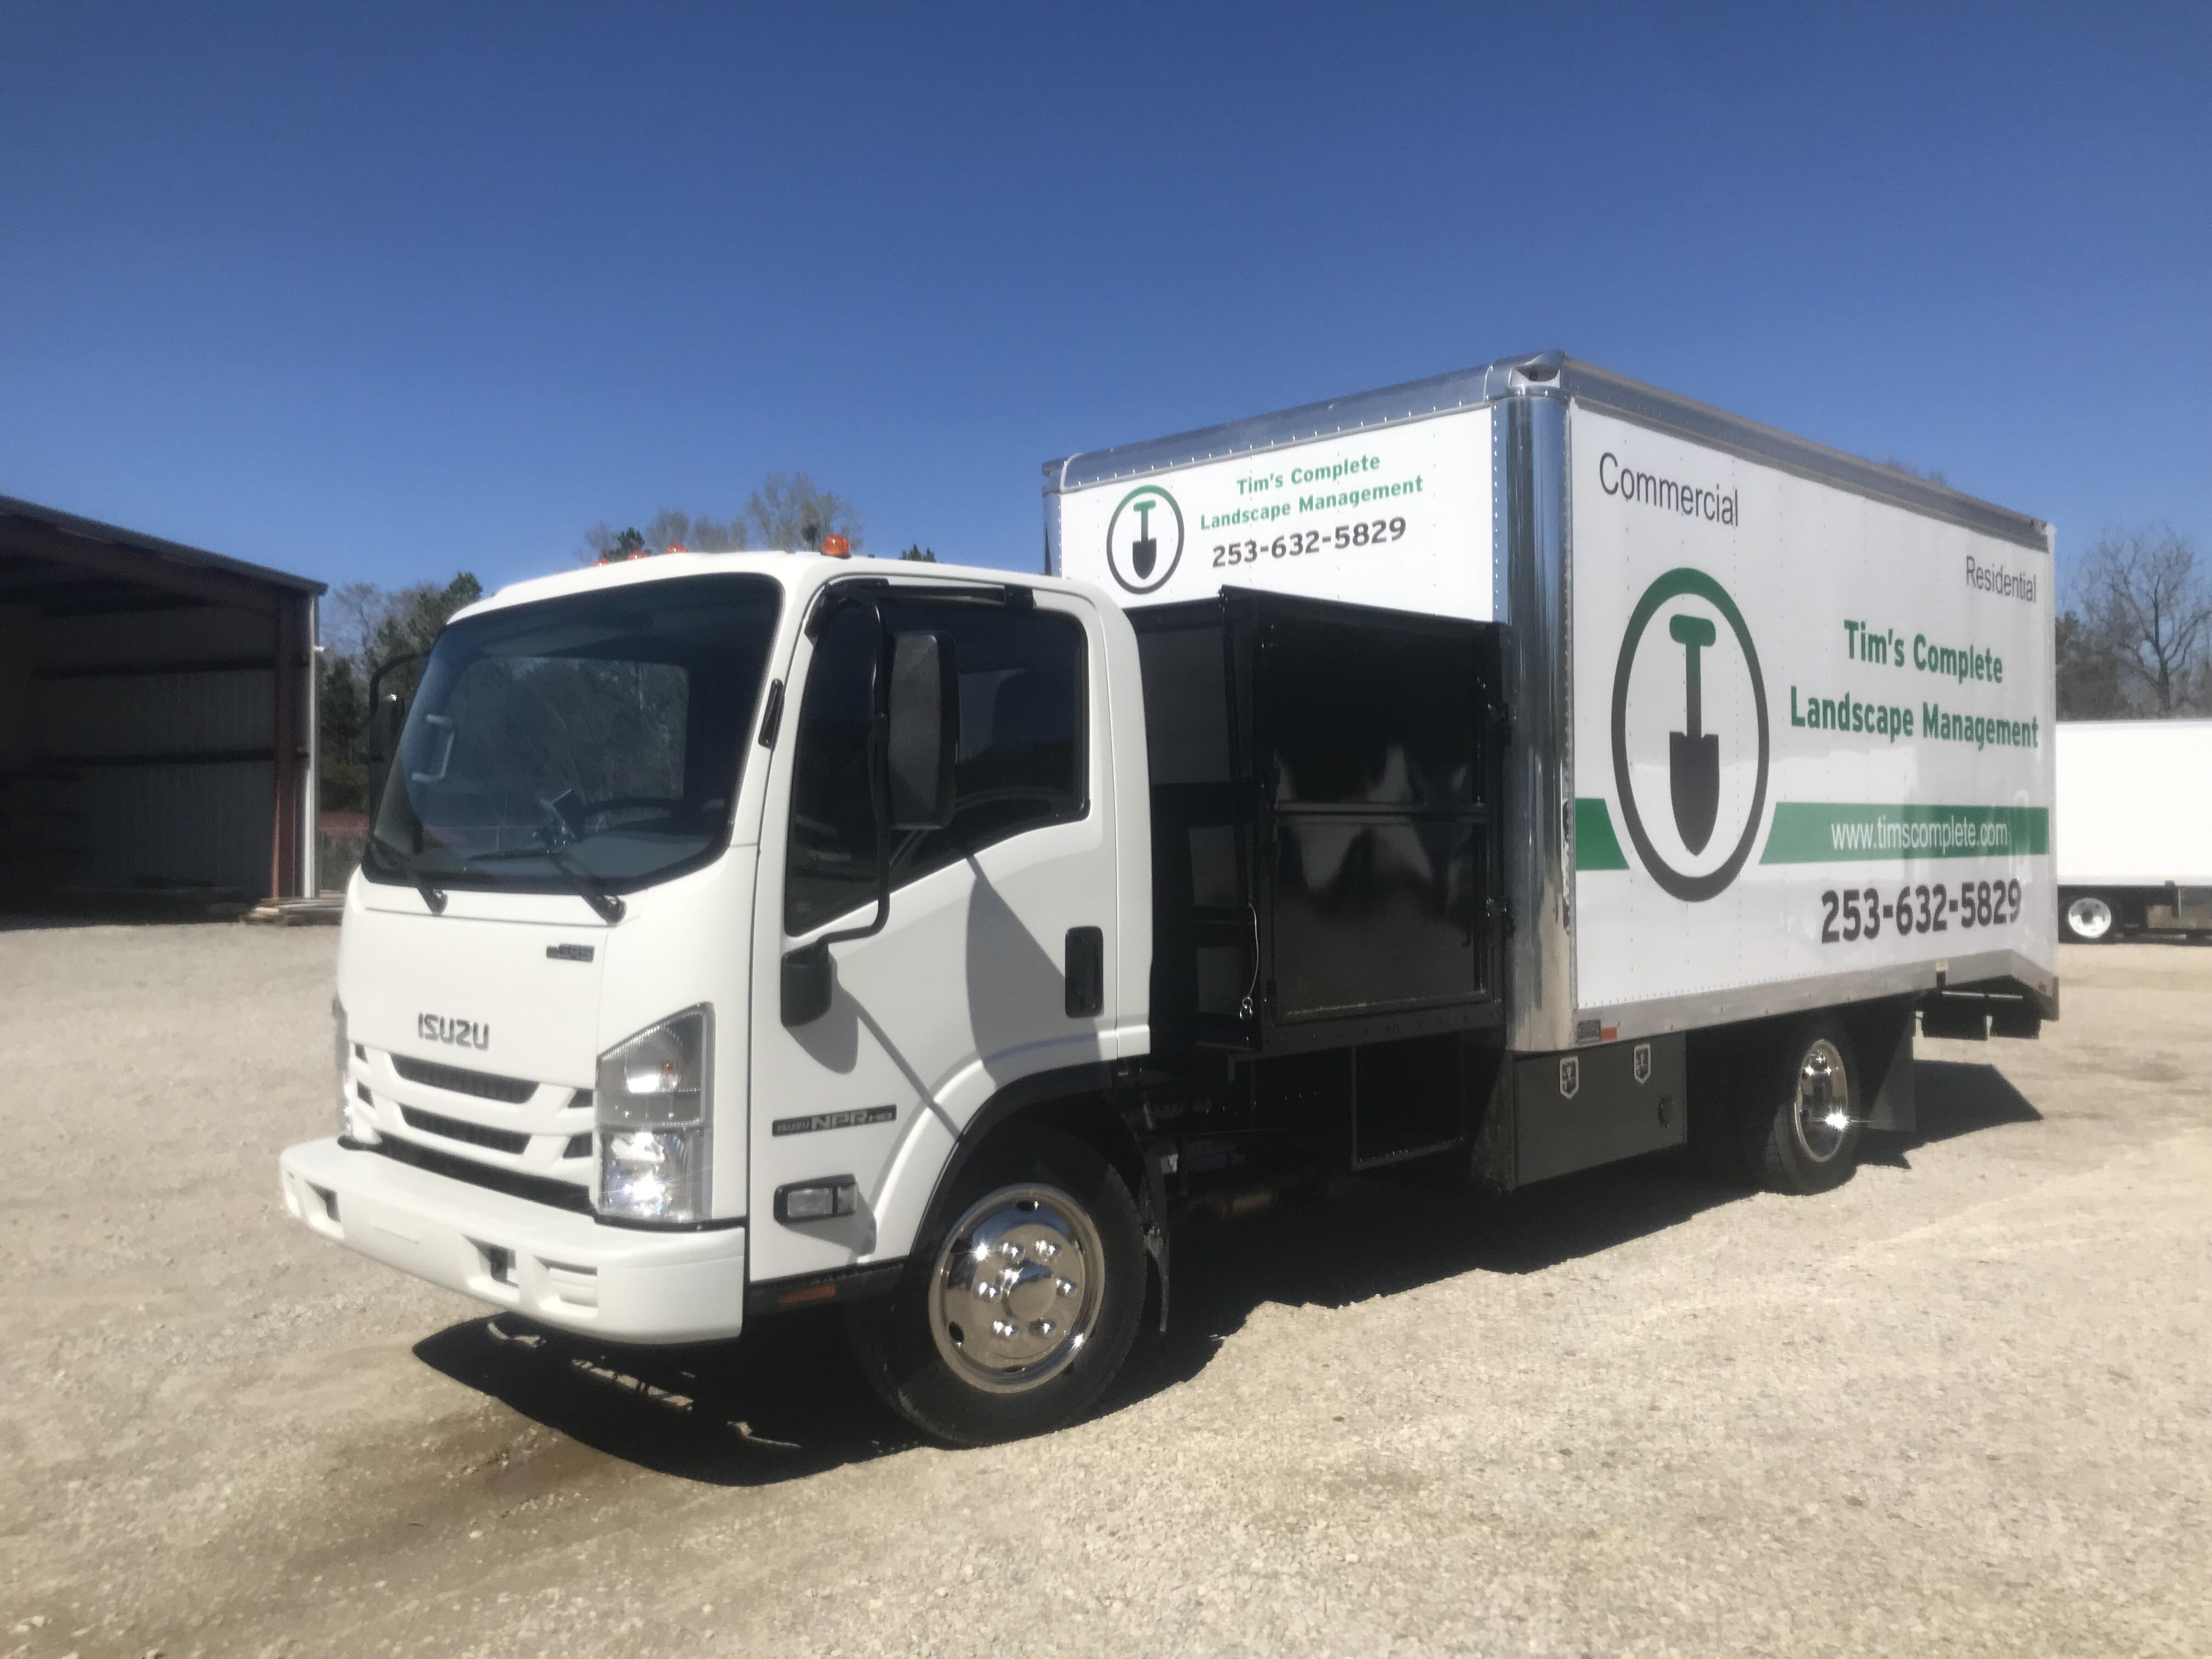 Press Release Local Washington Landscape Company Adopts Green Energy Solar Lawn Truck